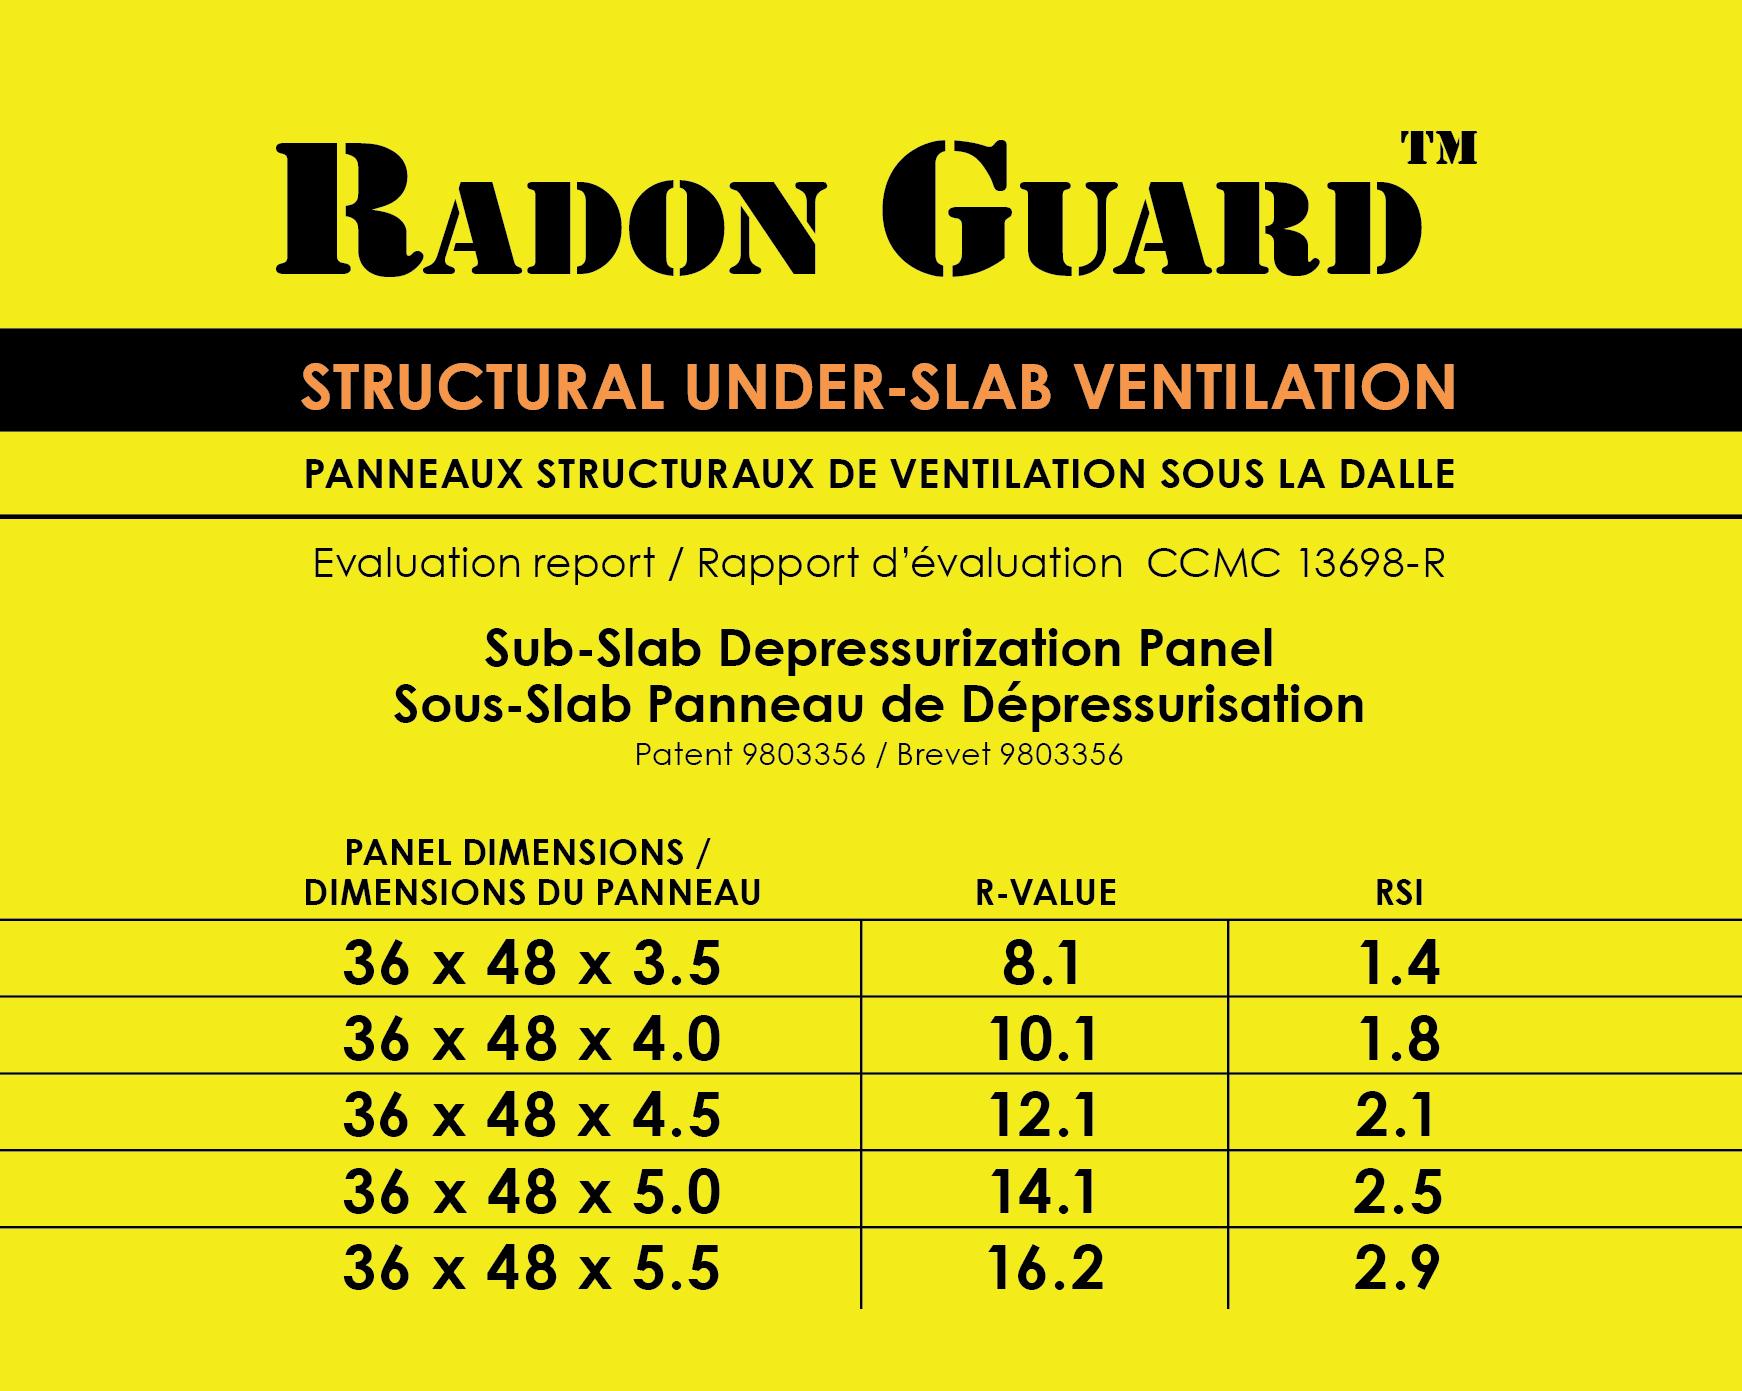 RadonGuard22_web.jpg